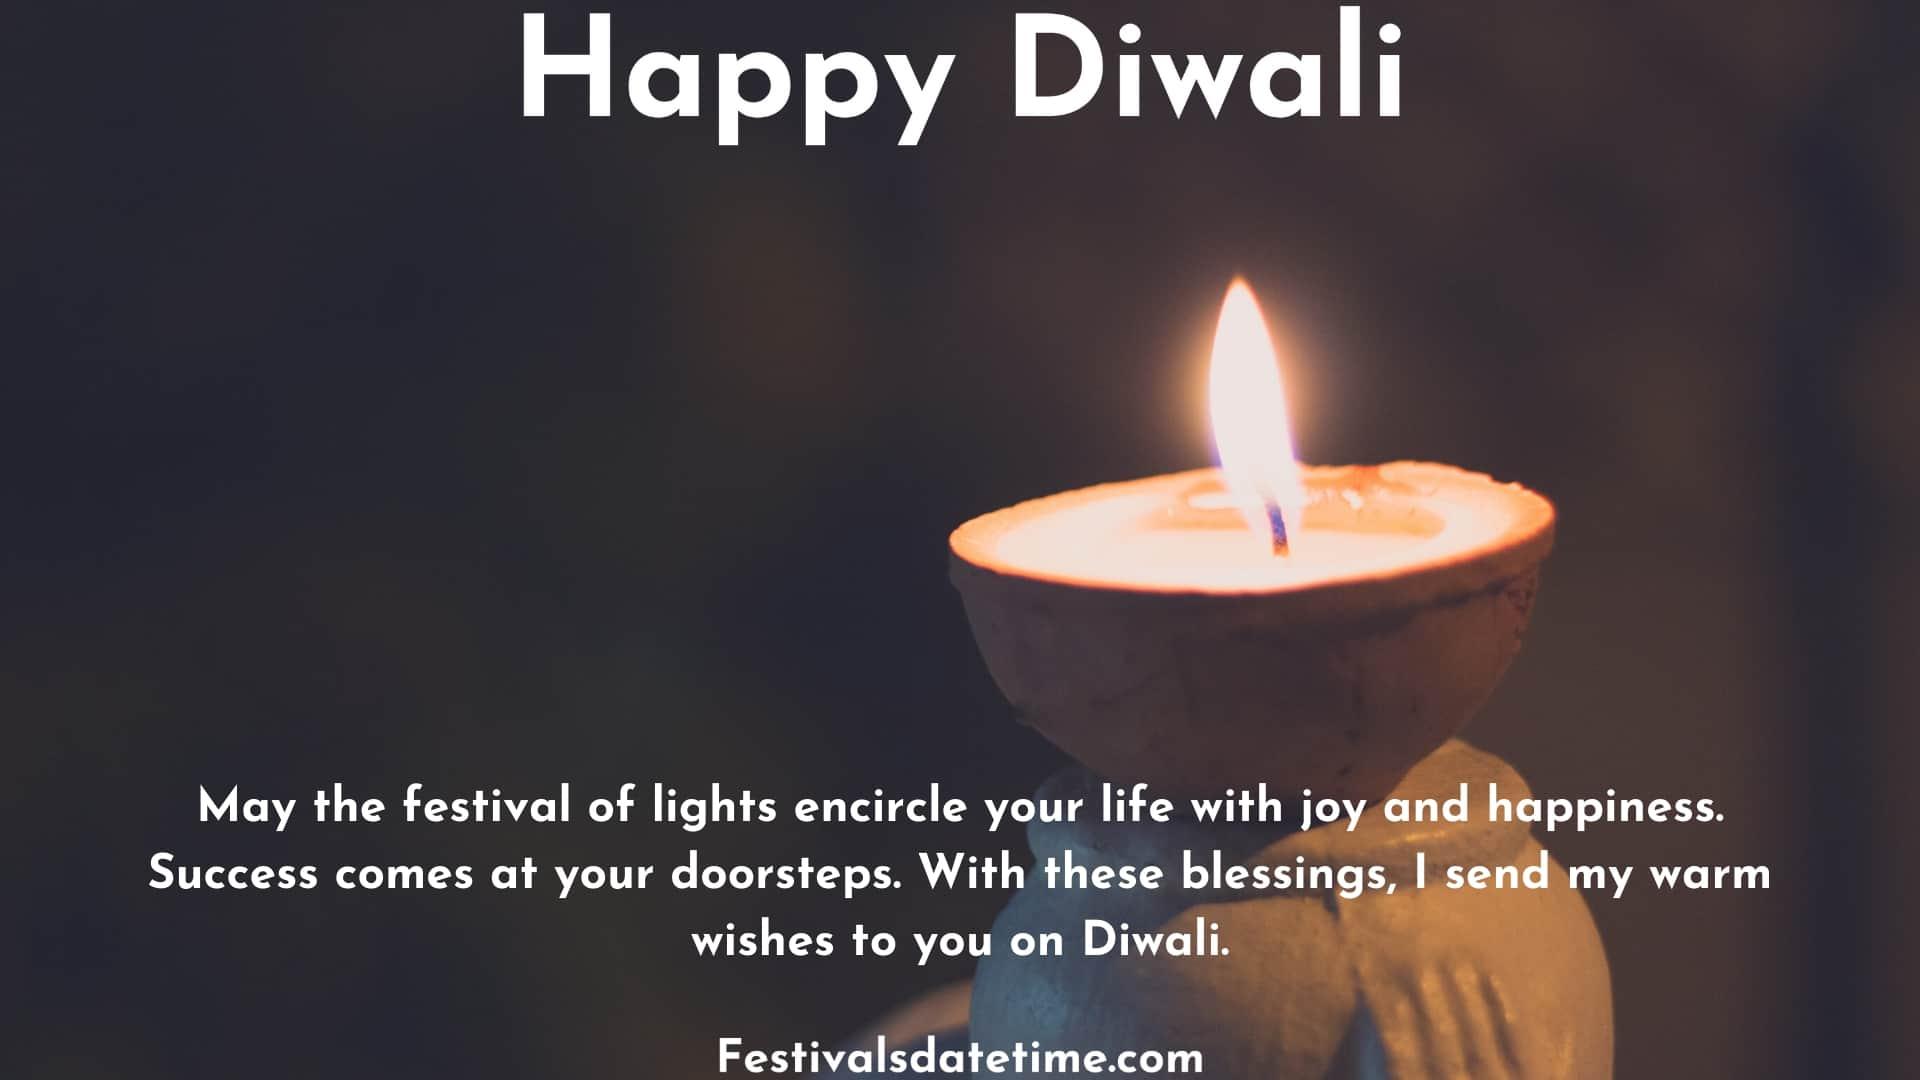 diwali_whatsapp_status_images